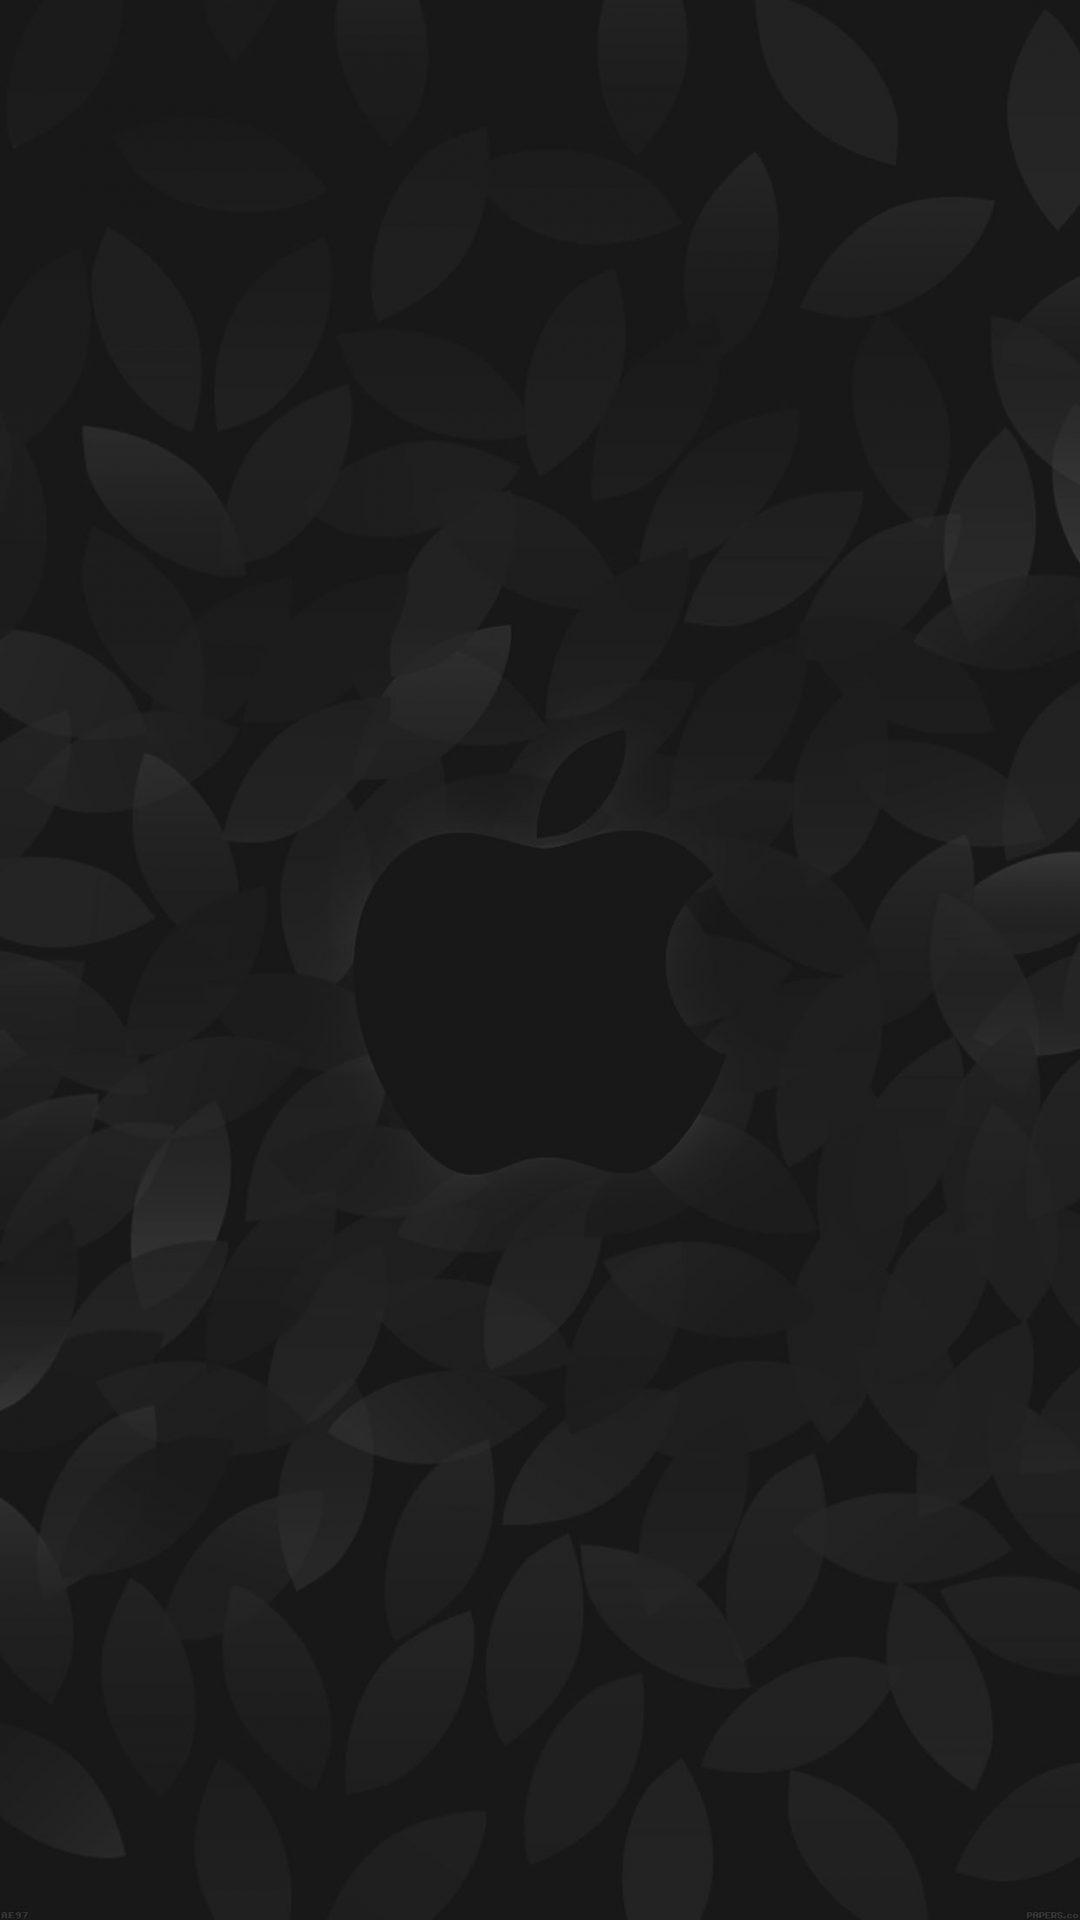 Apple In Fall Dark